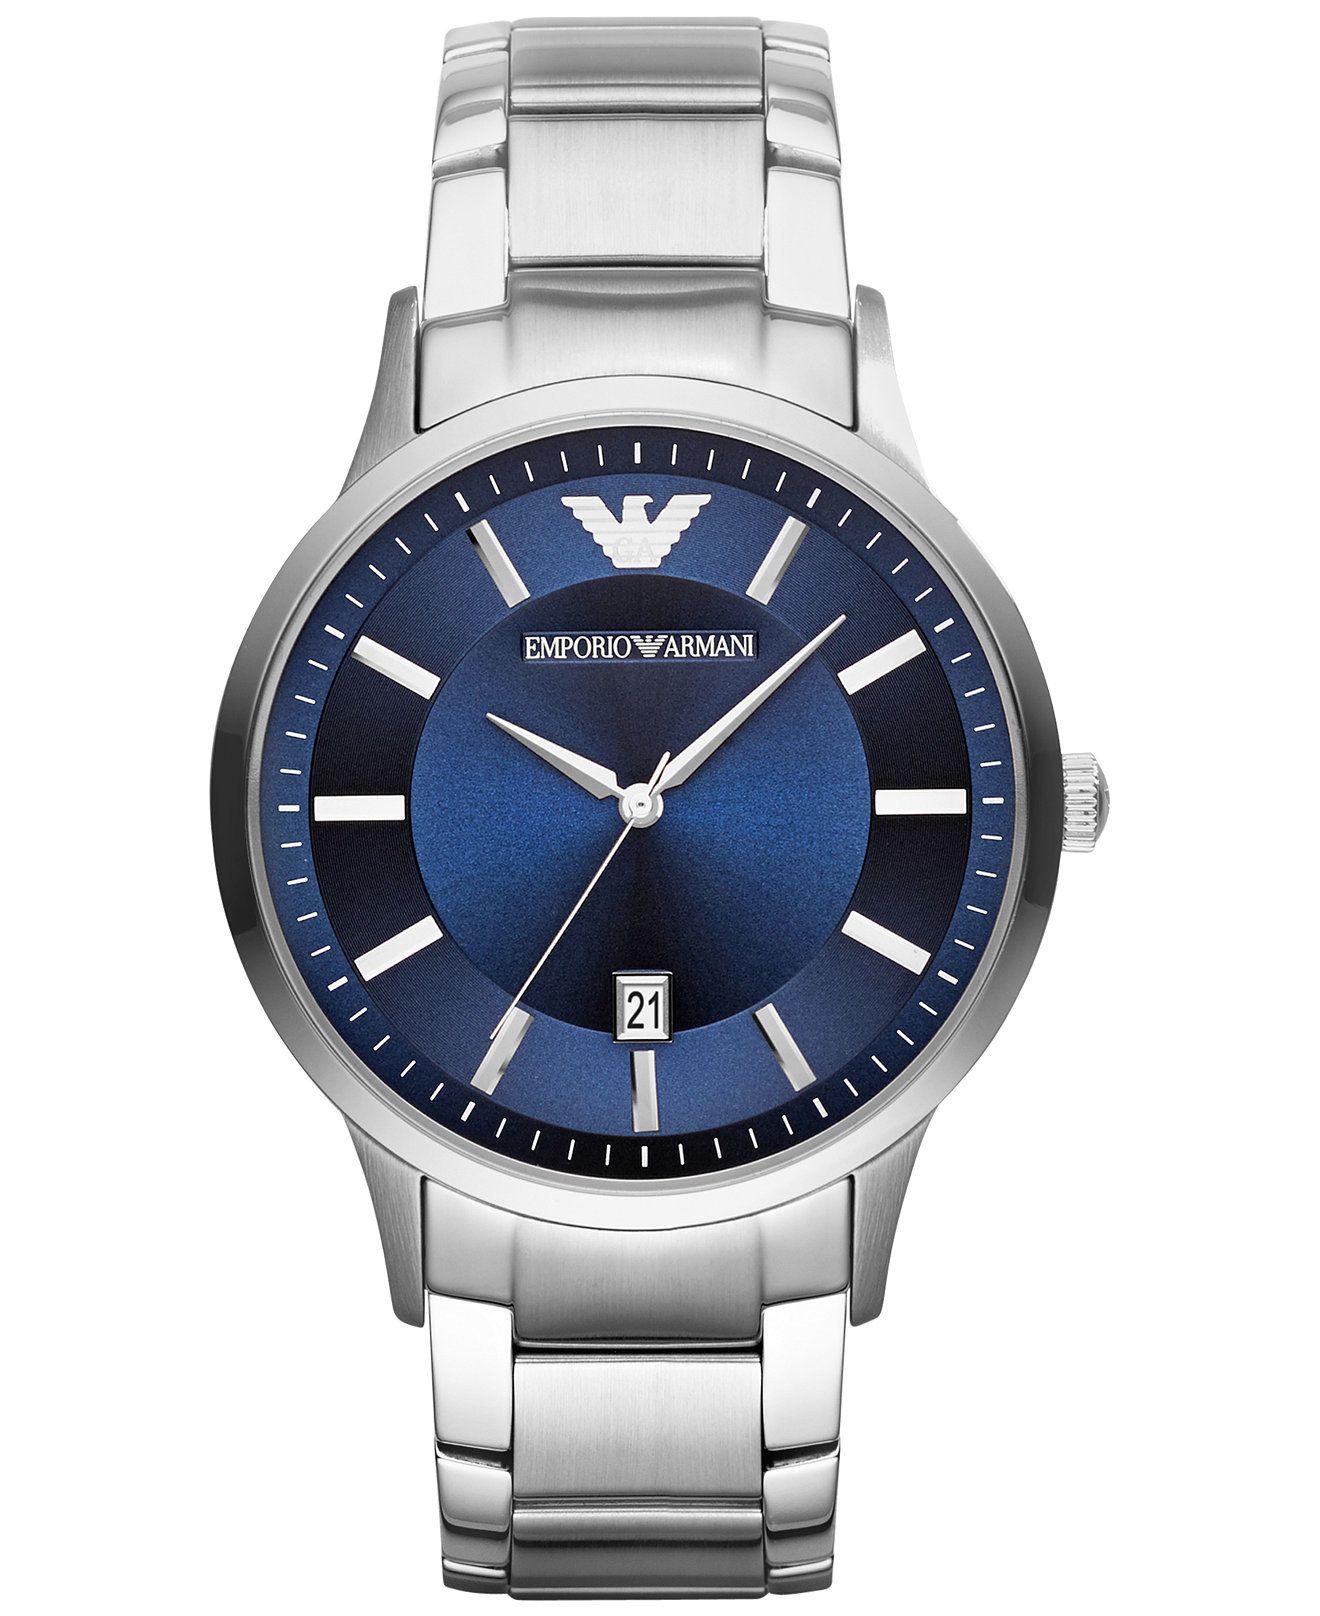 Emporio Armani Unisex Stainless Steel Bracelet Watch 43mm Ar2477  Women's  Watches  Jewelry & Watches